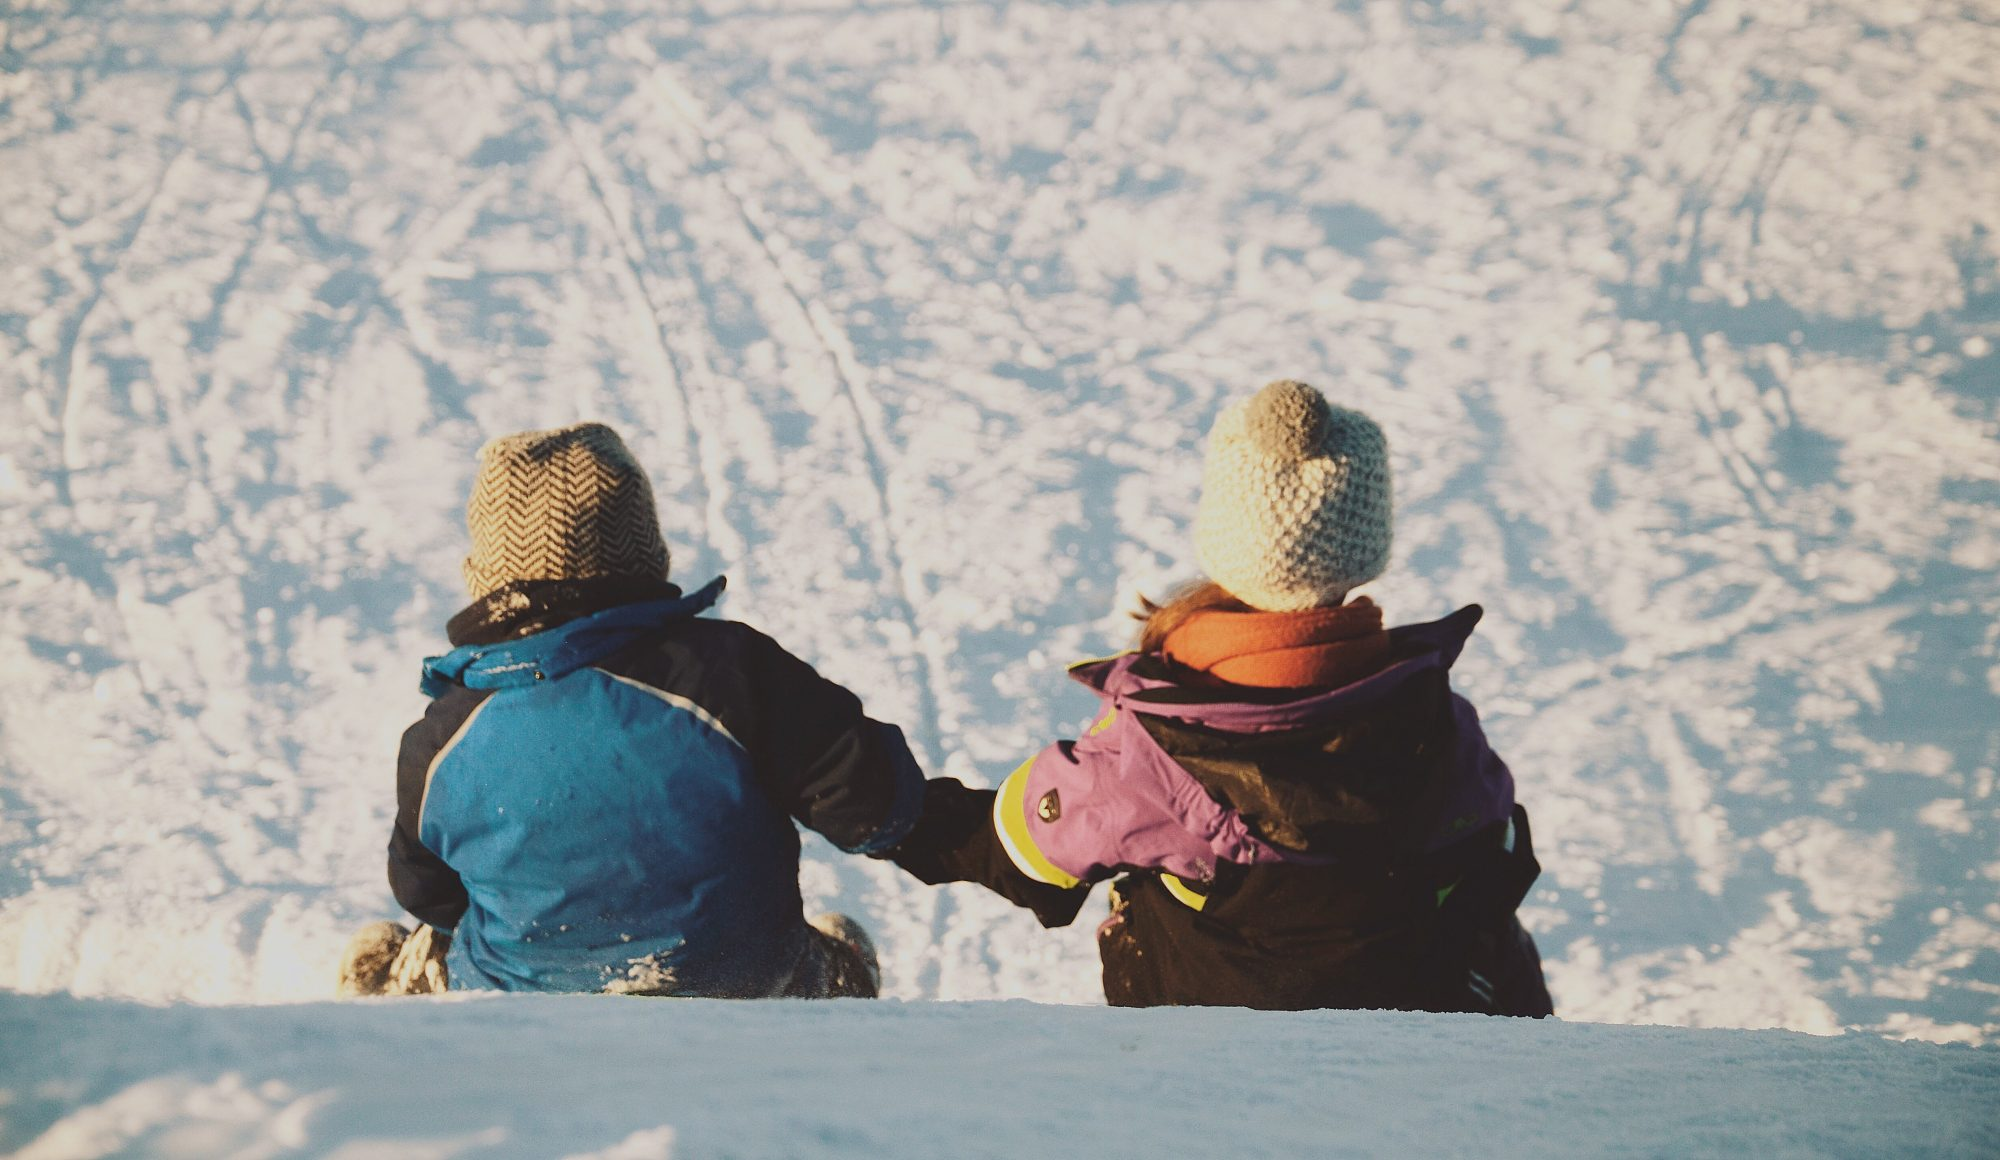 Suomi raportoi YK:lle lapsen oikeuksista